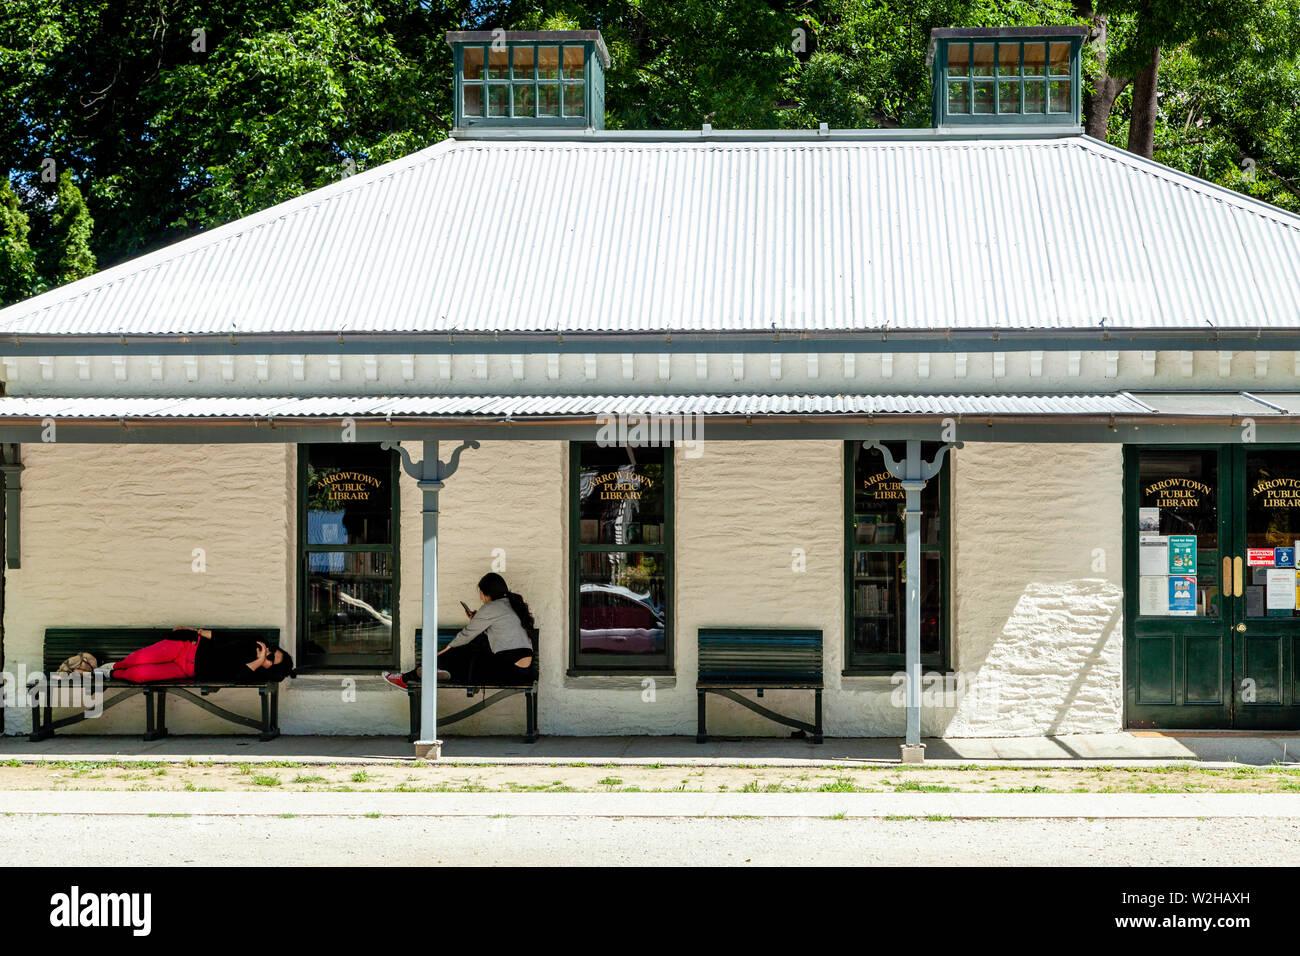 Arrowtown Public Library, Arrowtown, Otago Region, South Island, New Zealand - Stock Image